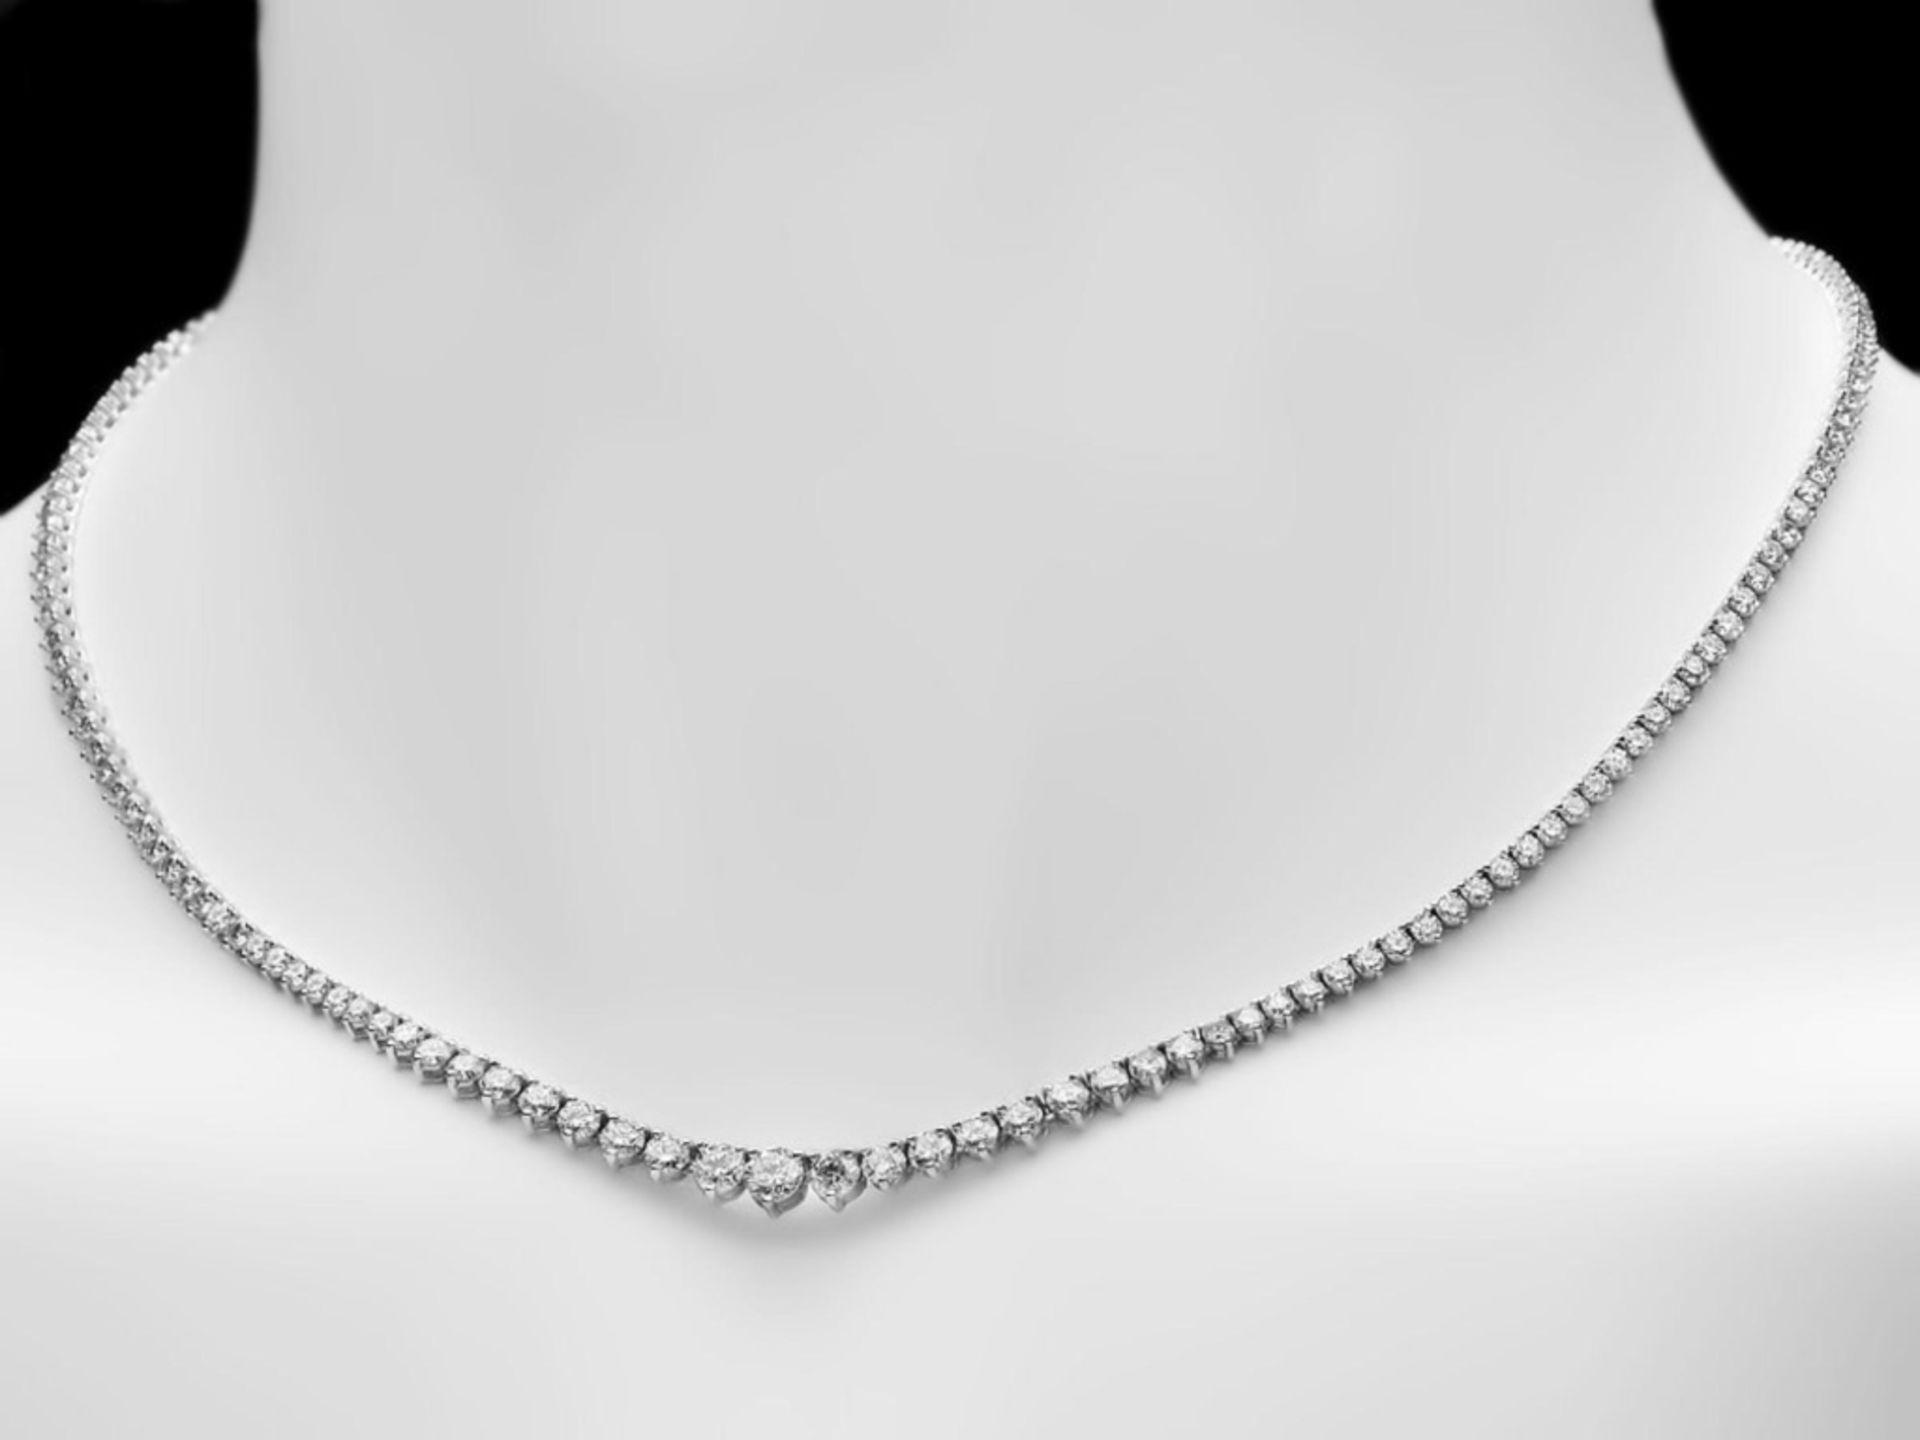 ^18k White Gold 10.00ct Diamond Necklace - Image 2 of 5